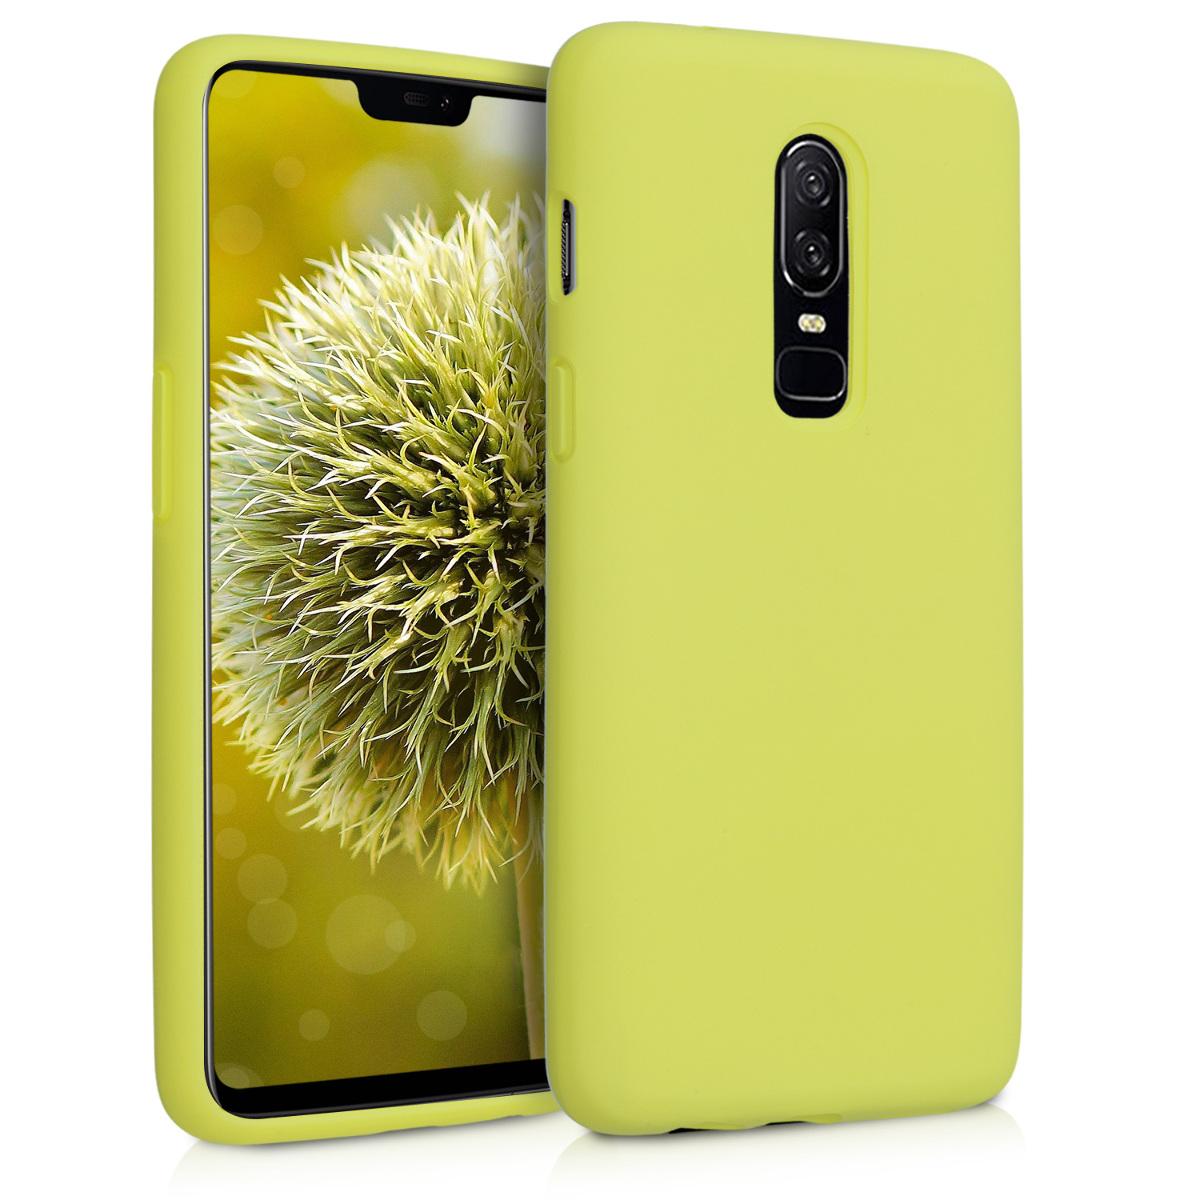 KW TPU Θήκη Σιλικόνης - OnePlus 6 - Neon Yellow (46122.49)